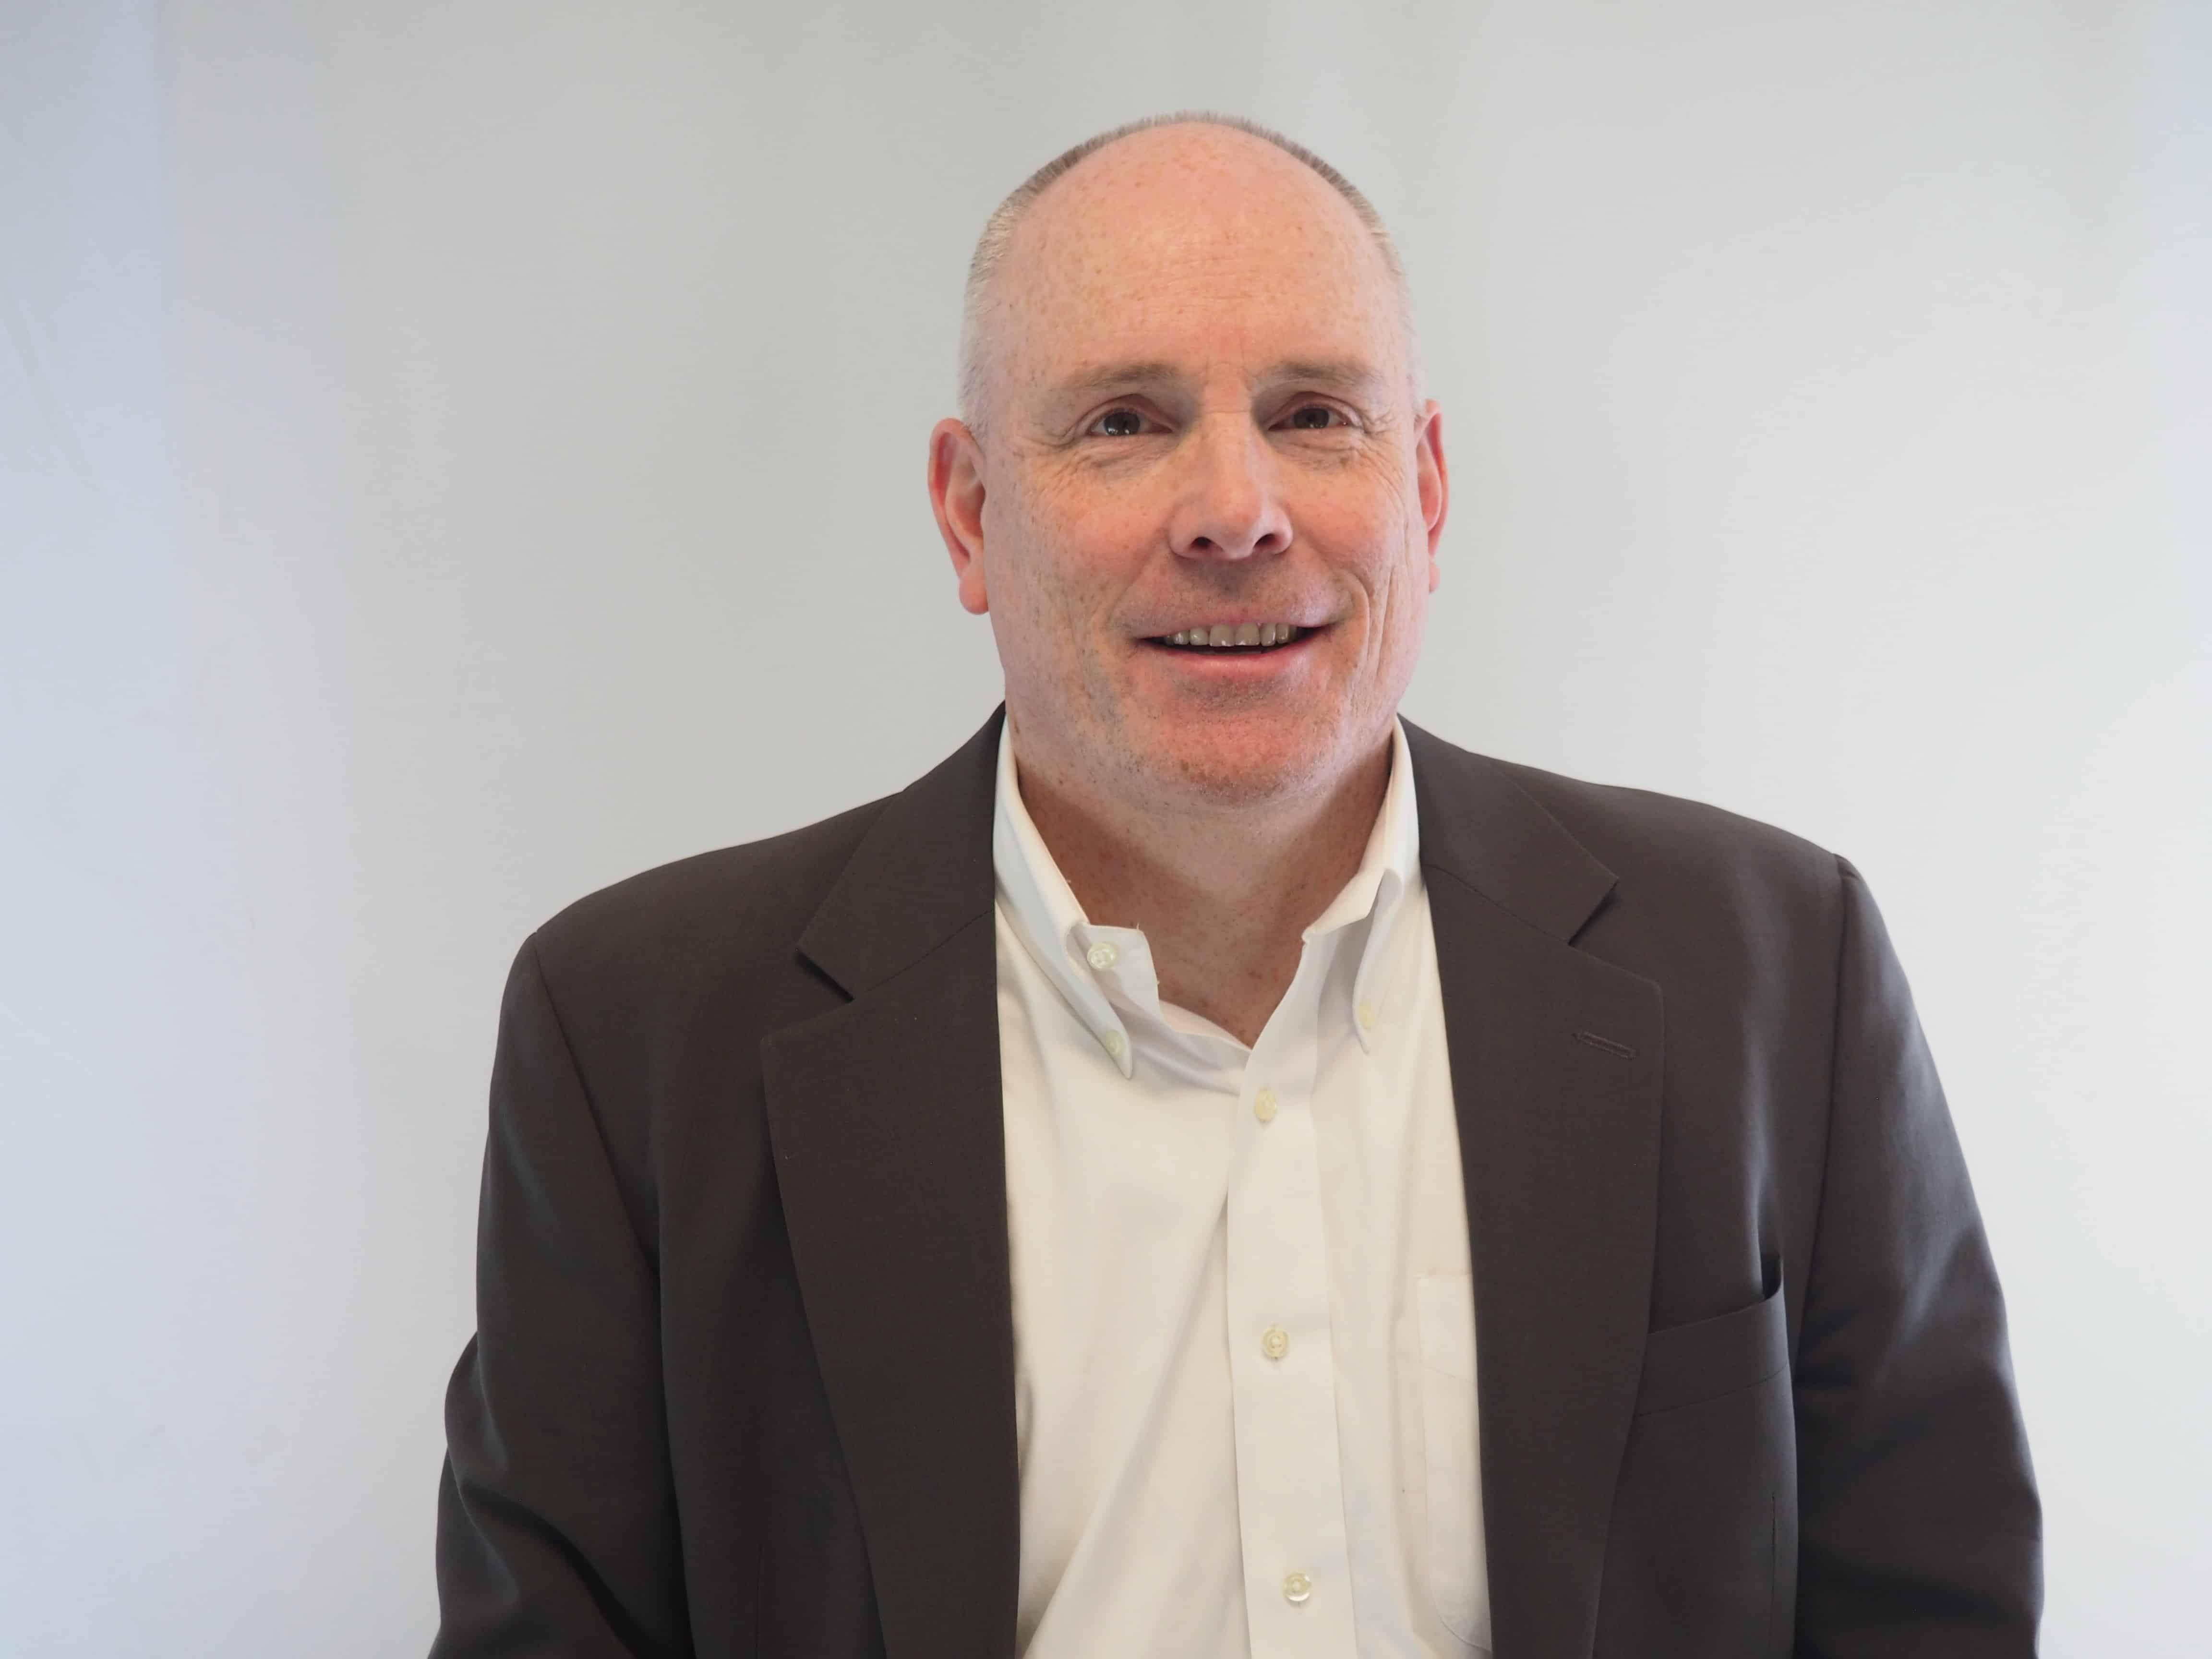 Kevin McDonald, Vice President